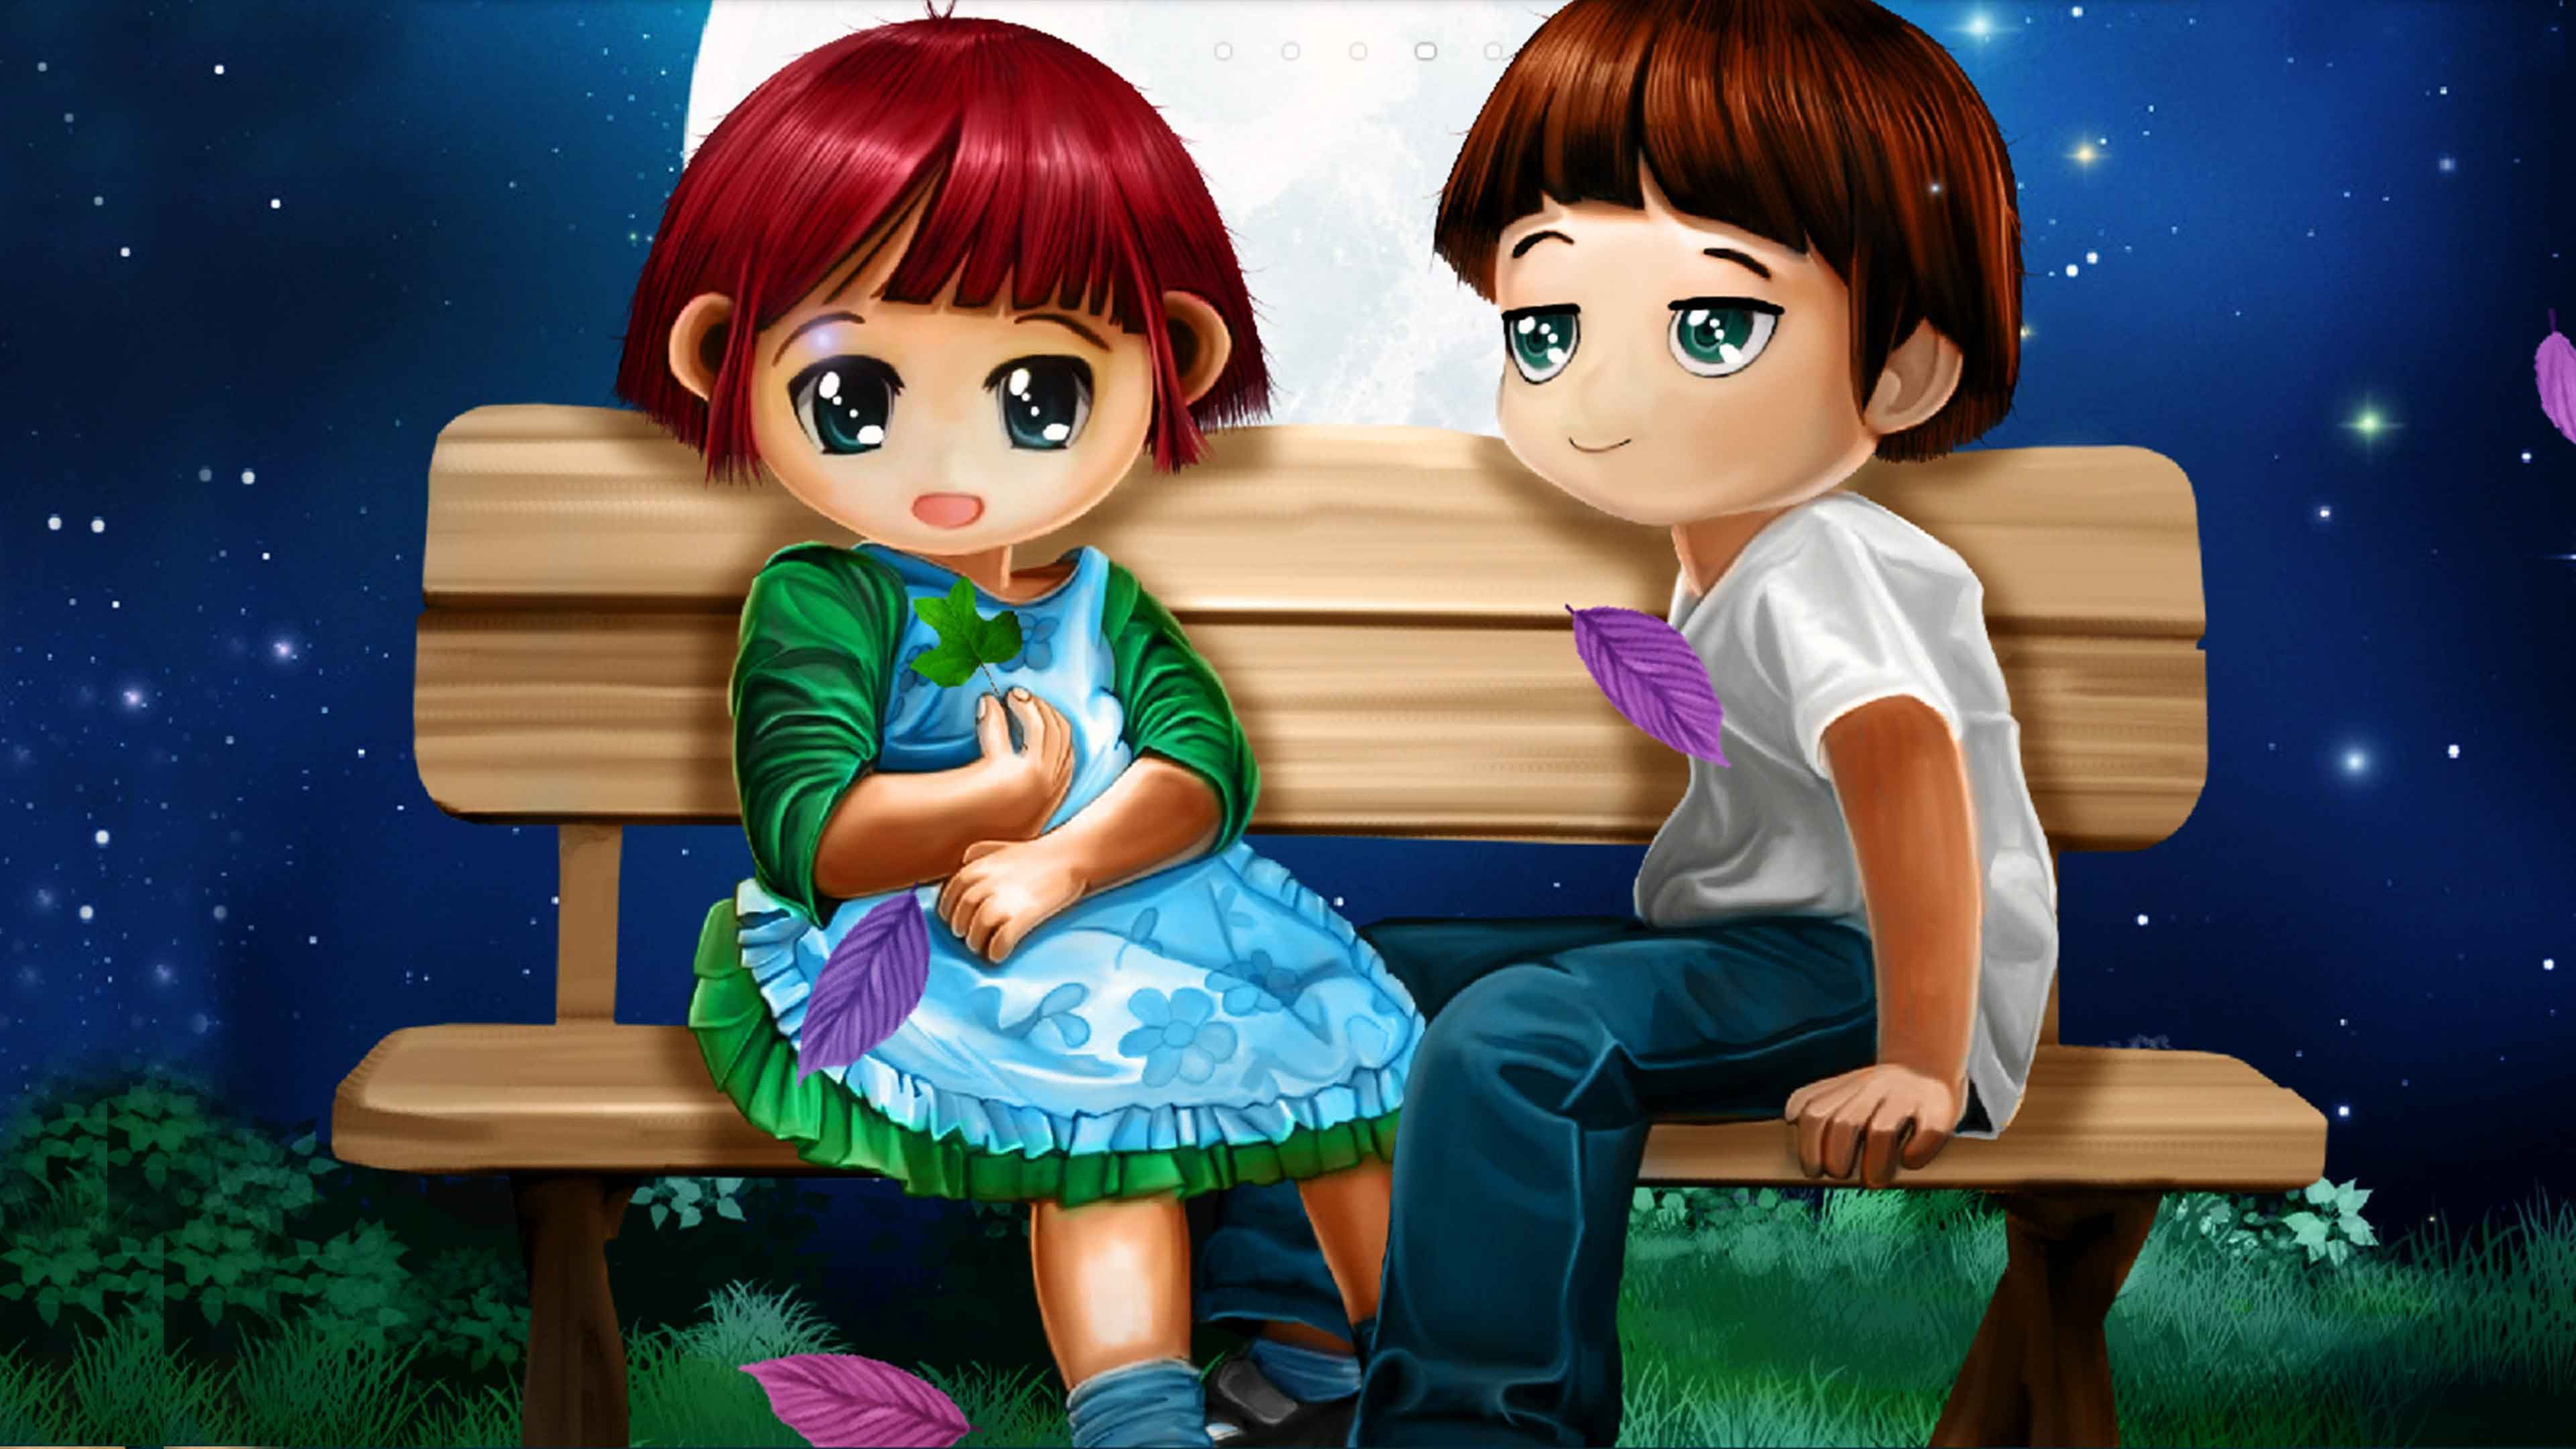 3d Love Couple Cartoon Wallpapers Download 3d Wallpaper Hd Cute Cartoon Wallpapers Love Sketch Images Cartoon